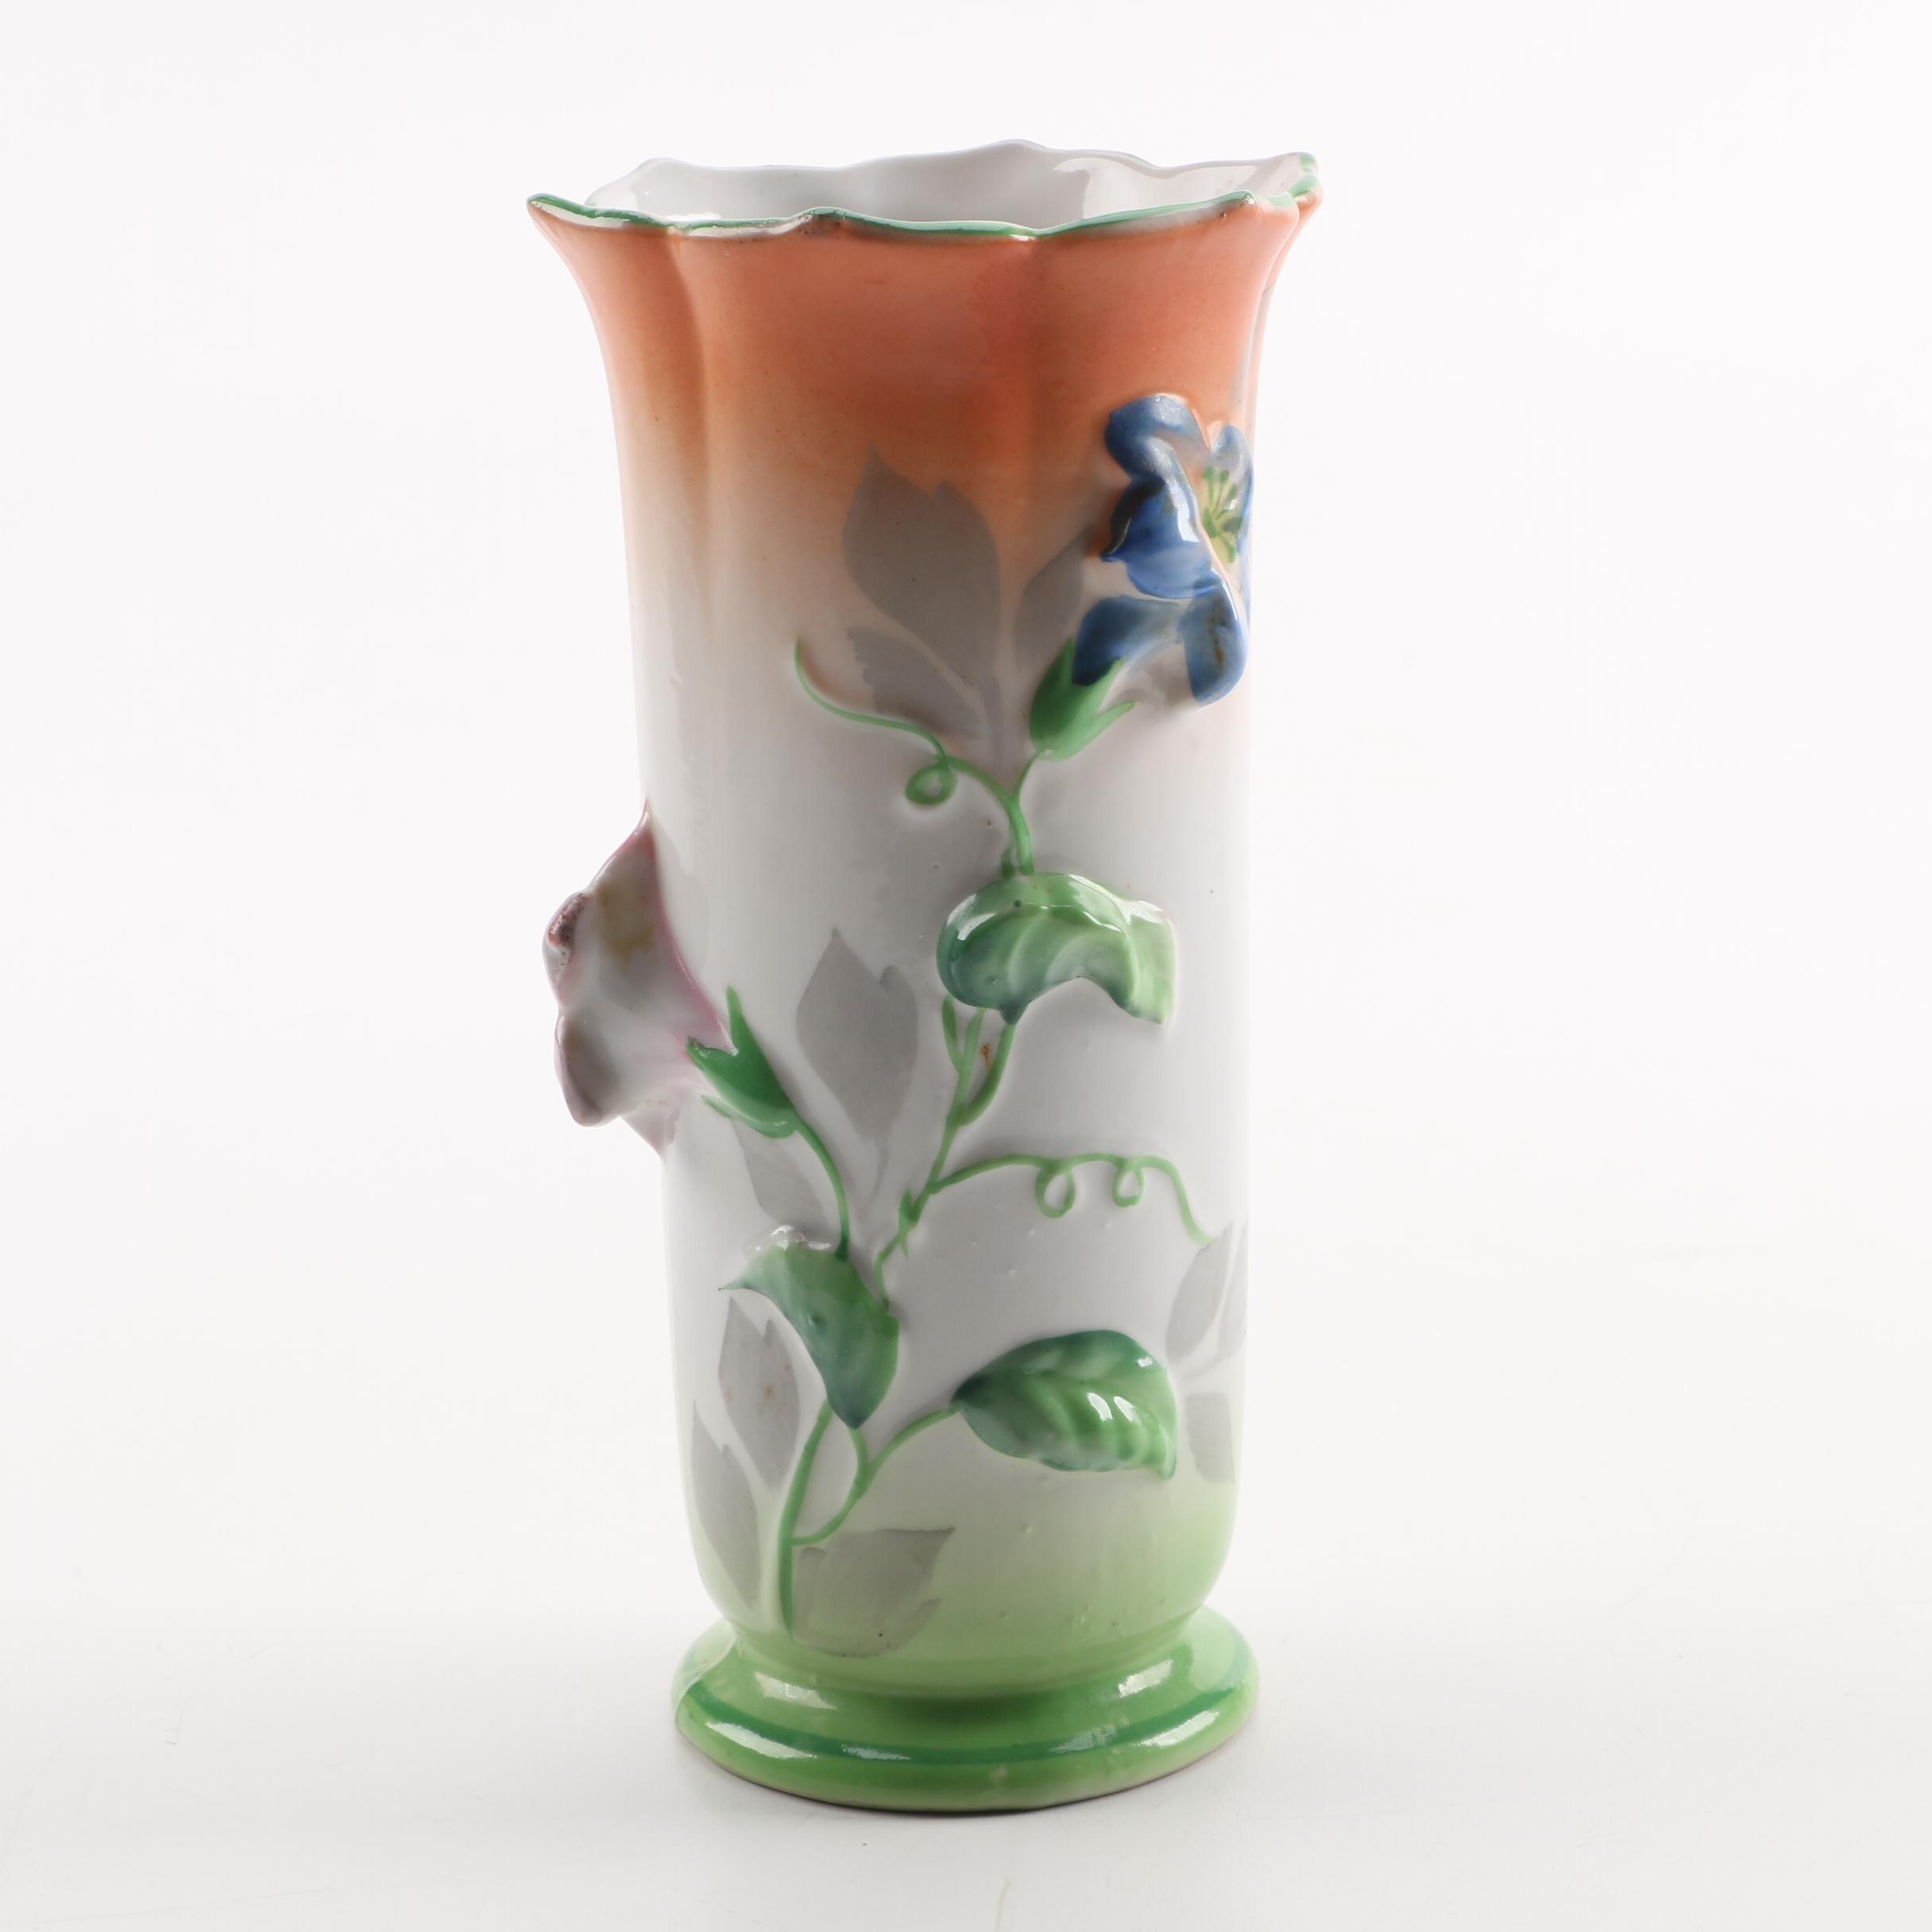 Vintage Hand-Painted Japanese Trico Vase